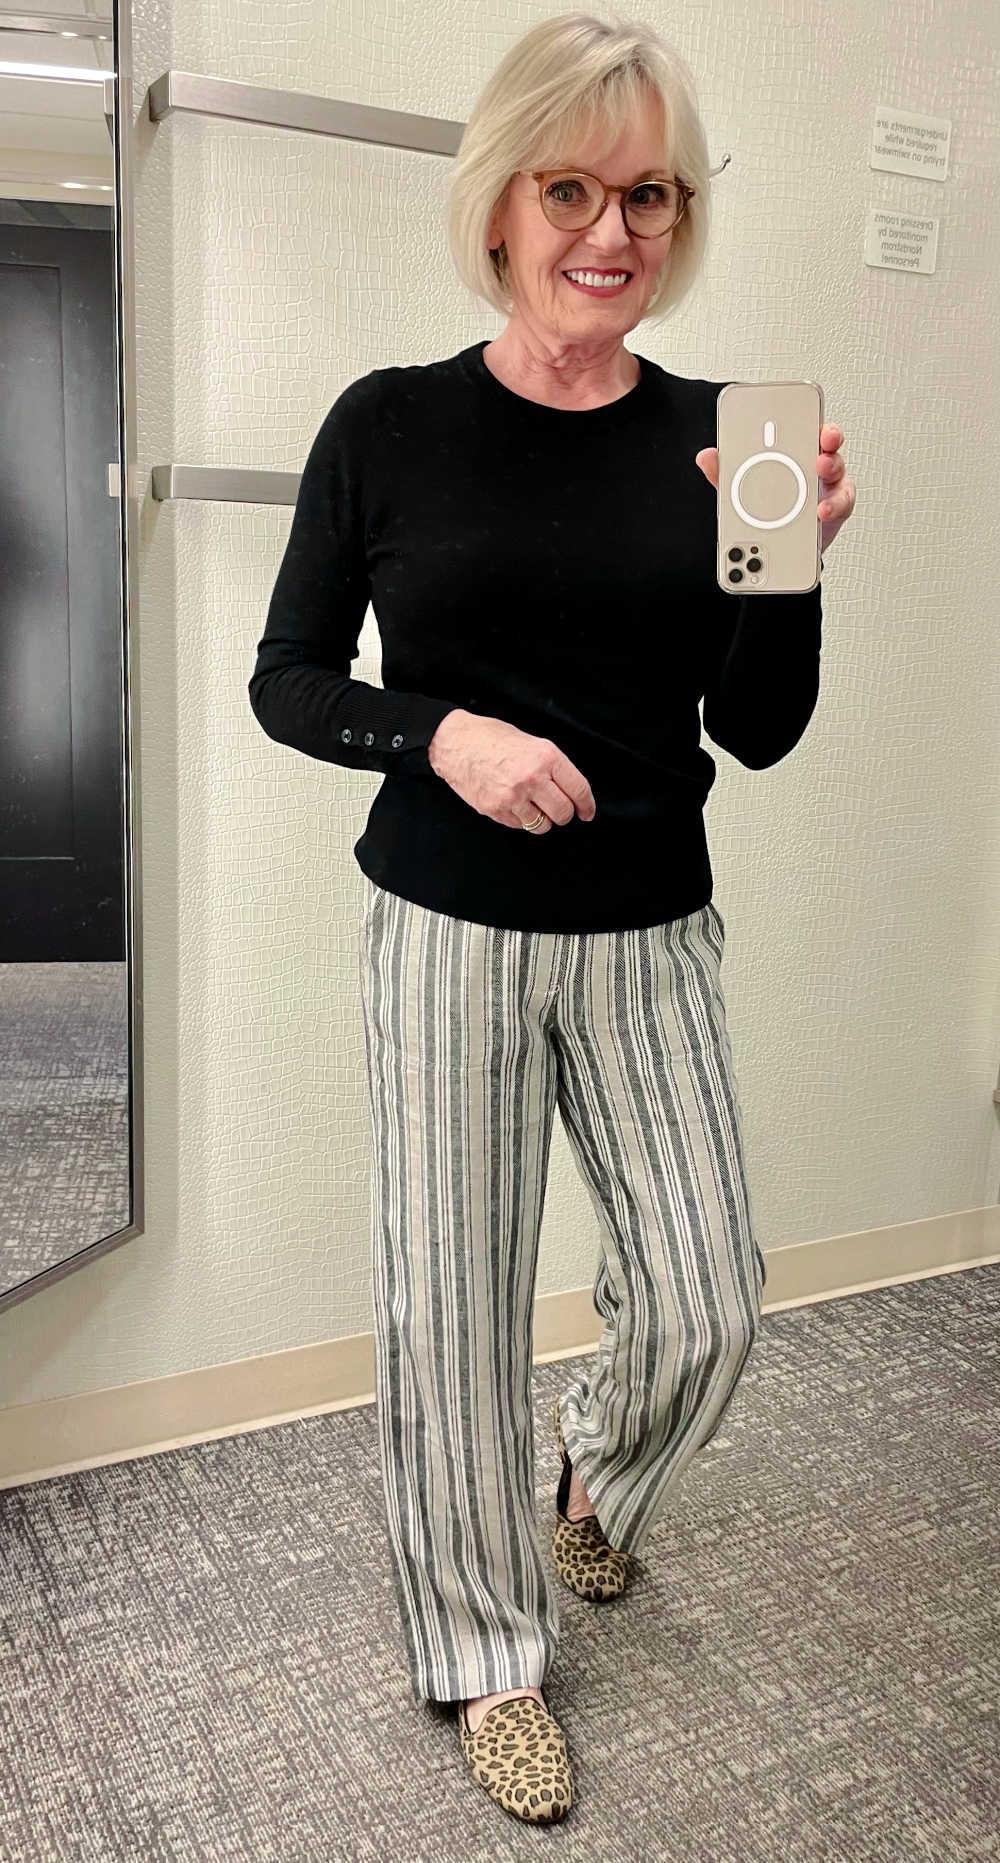 woman taking selfie in mirror wearing black sweater and striped linen pants